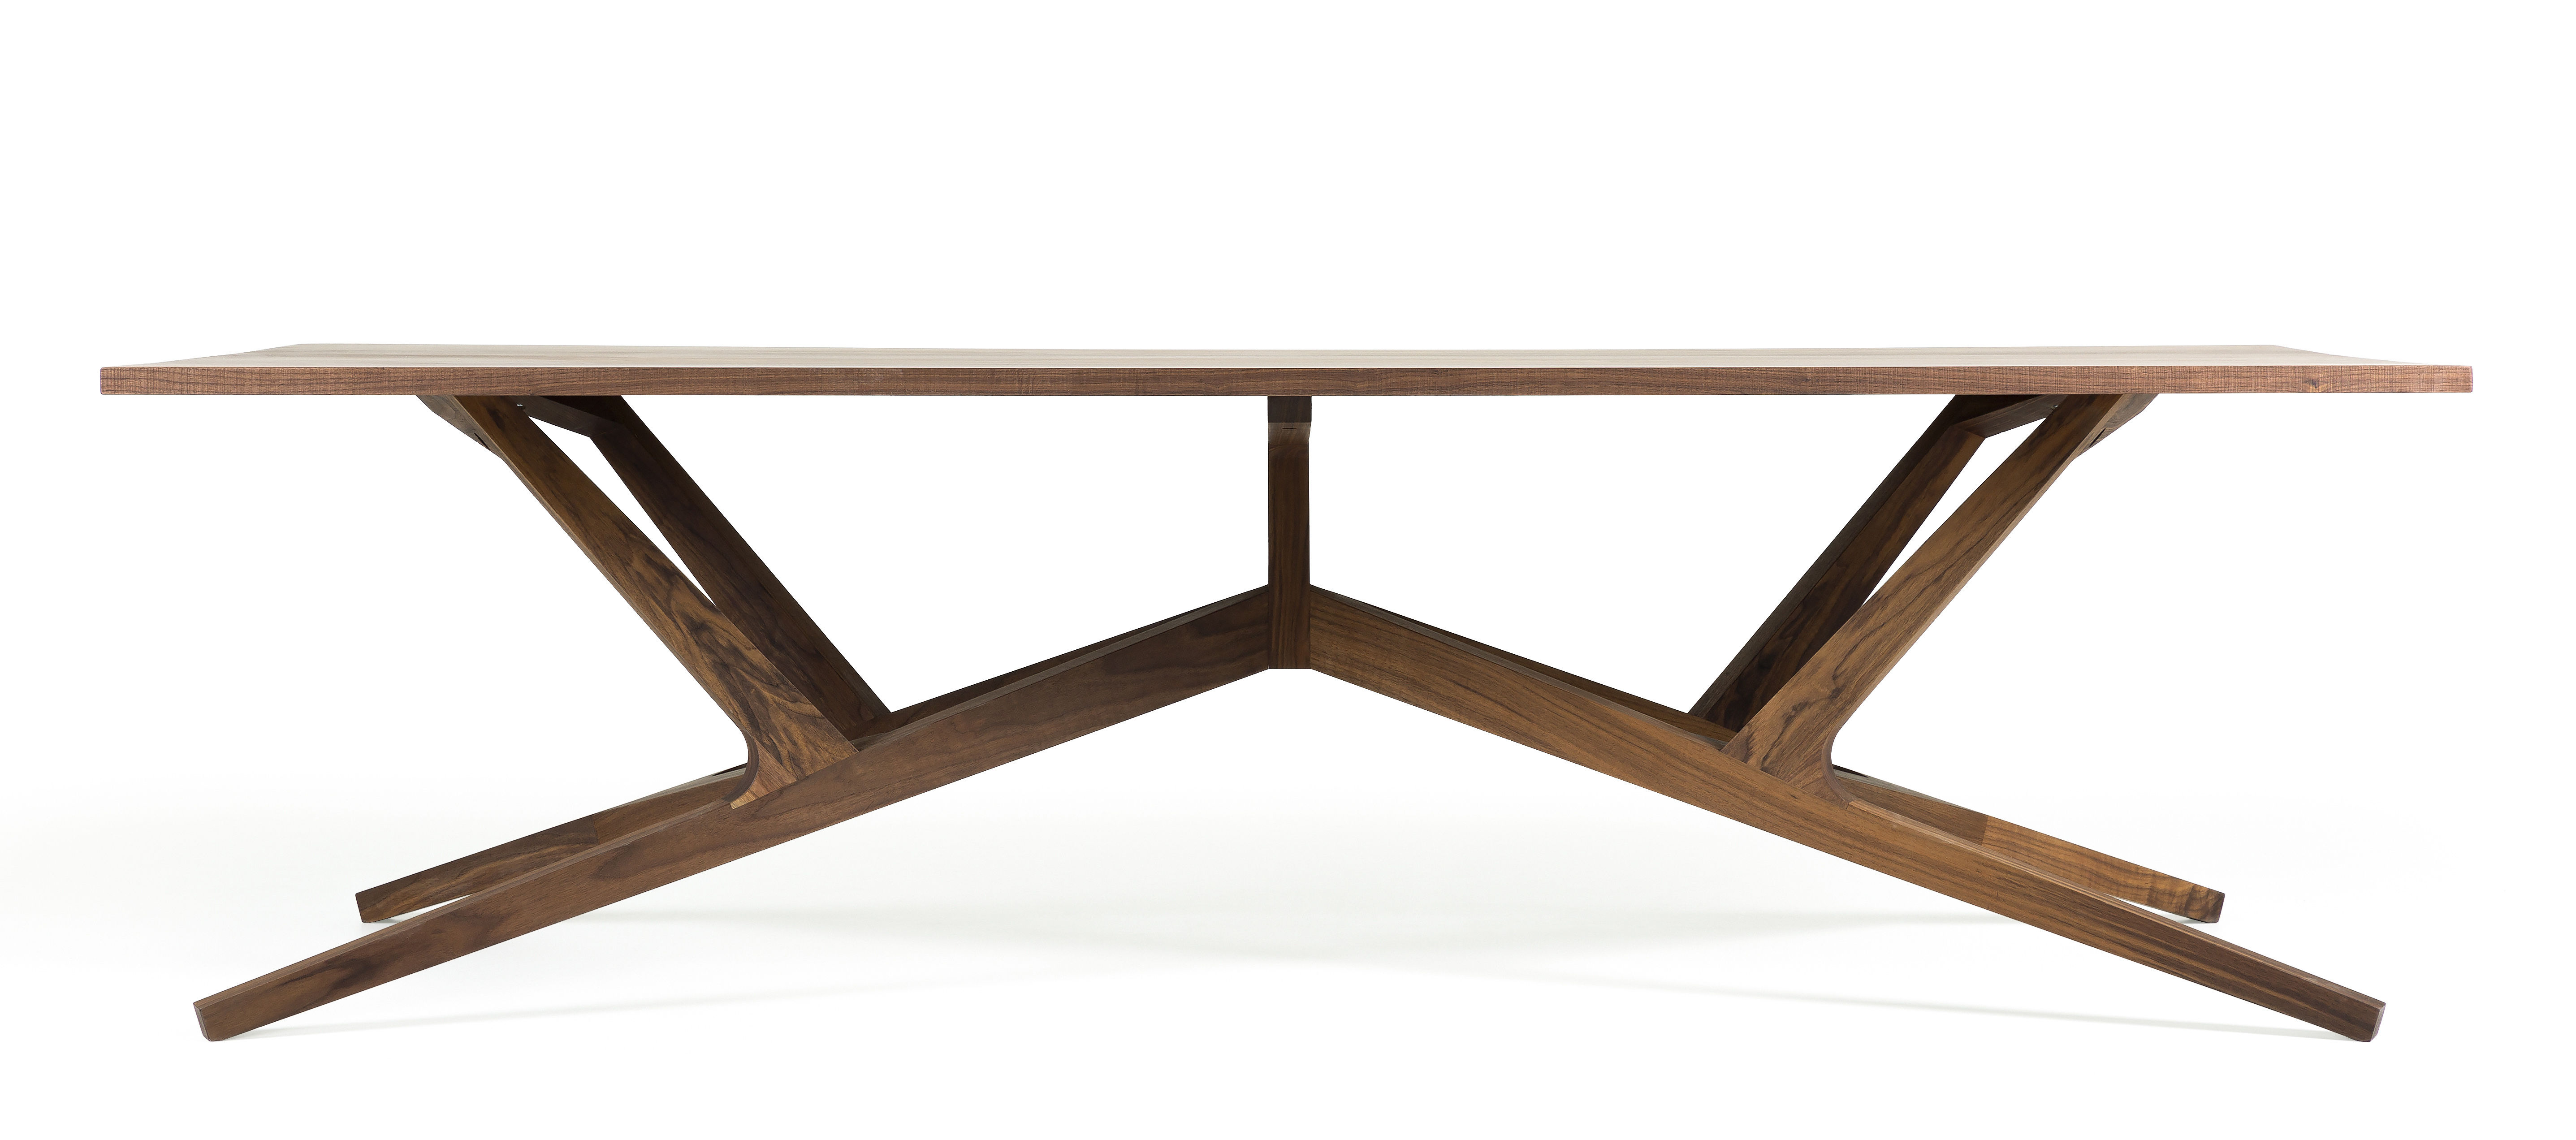 Furniture - Dining Tables - Liberty Rectangular table - / Solid walnut - 260 x 110 cm by Moooi - Walnut - Solid walnut